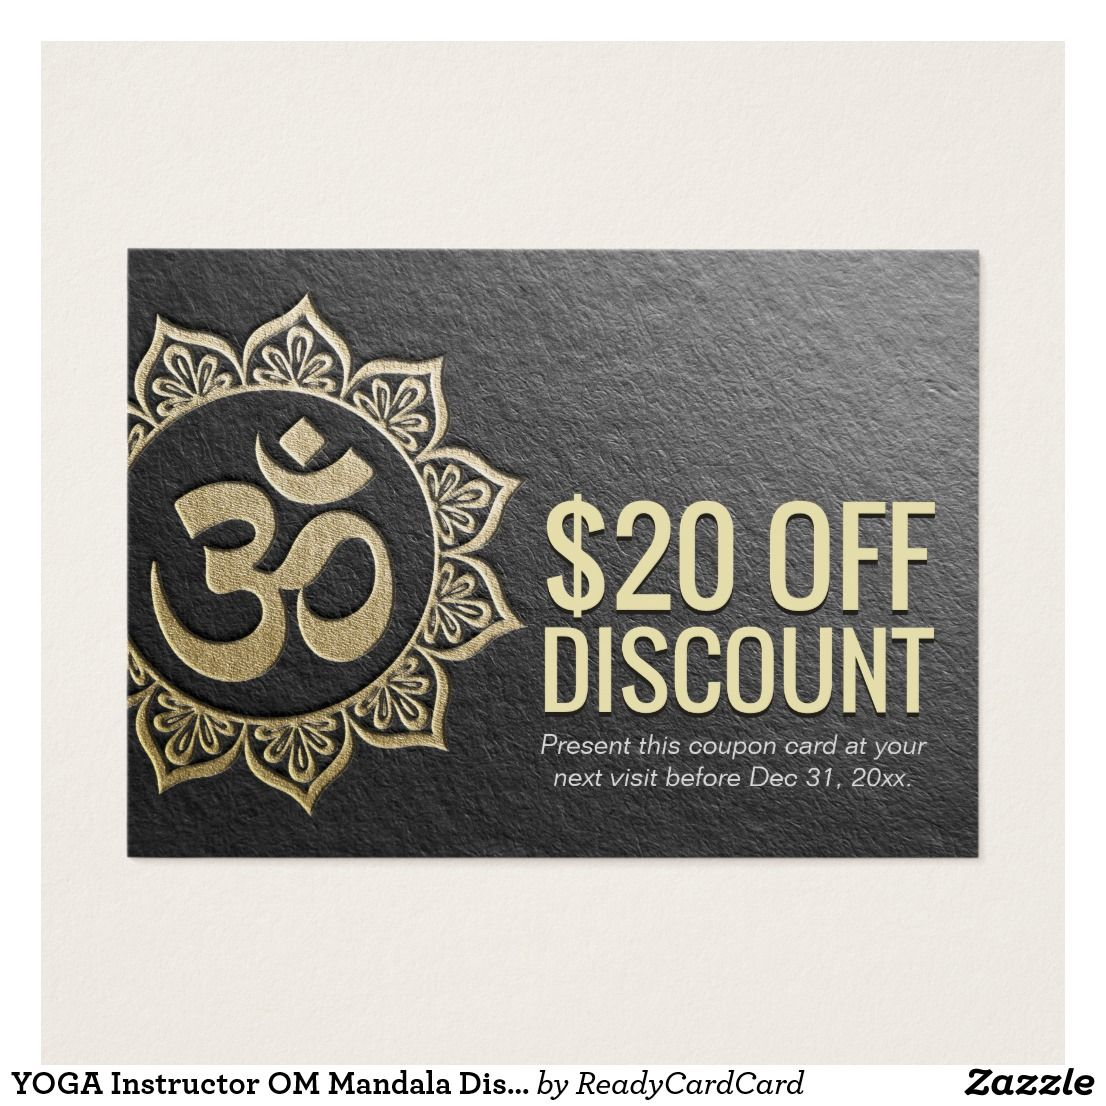 YOGA Instructor OM Mandala Discount Coupon Loyalty | Discount ...